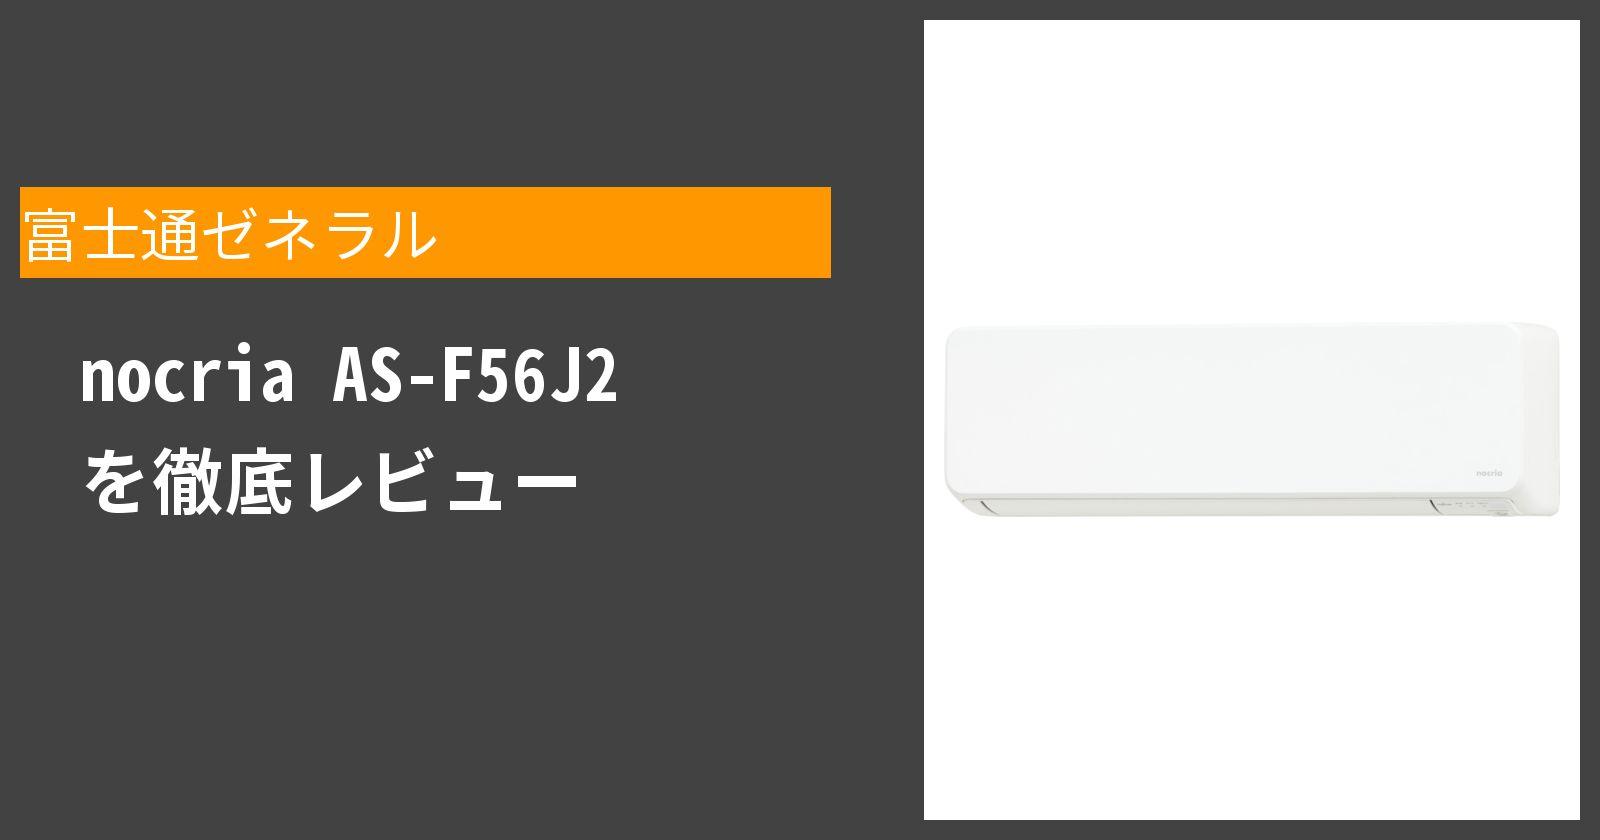 nocria AS-F56J2を徹底評価